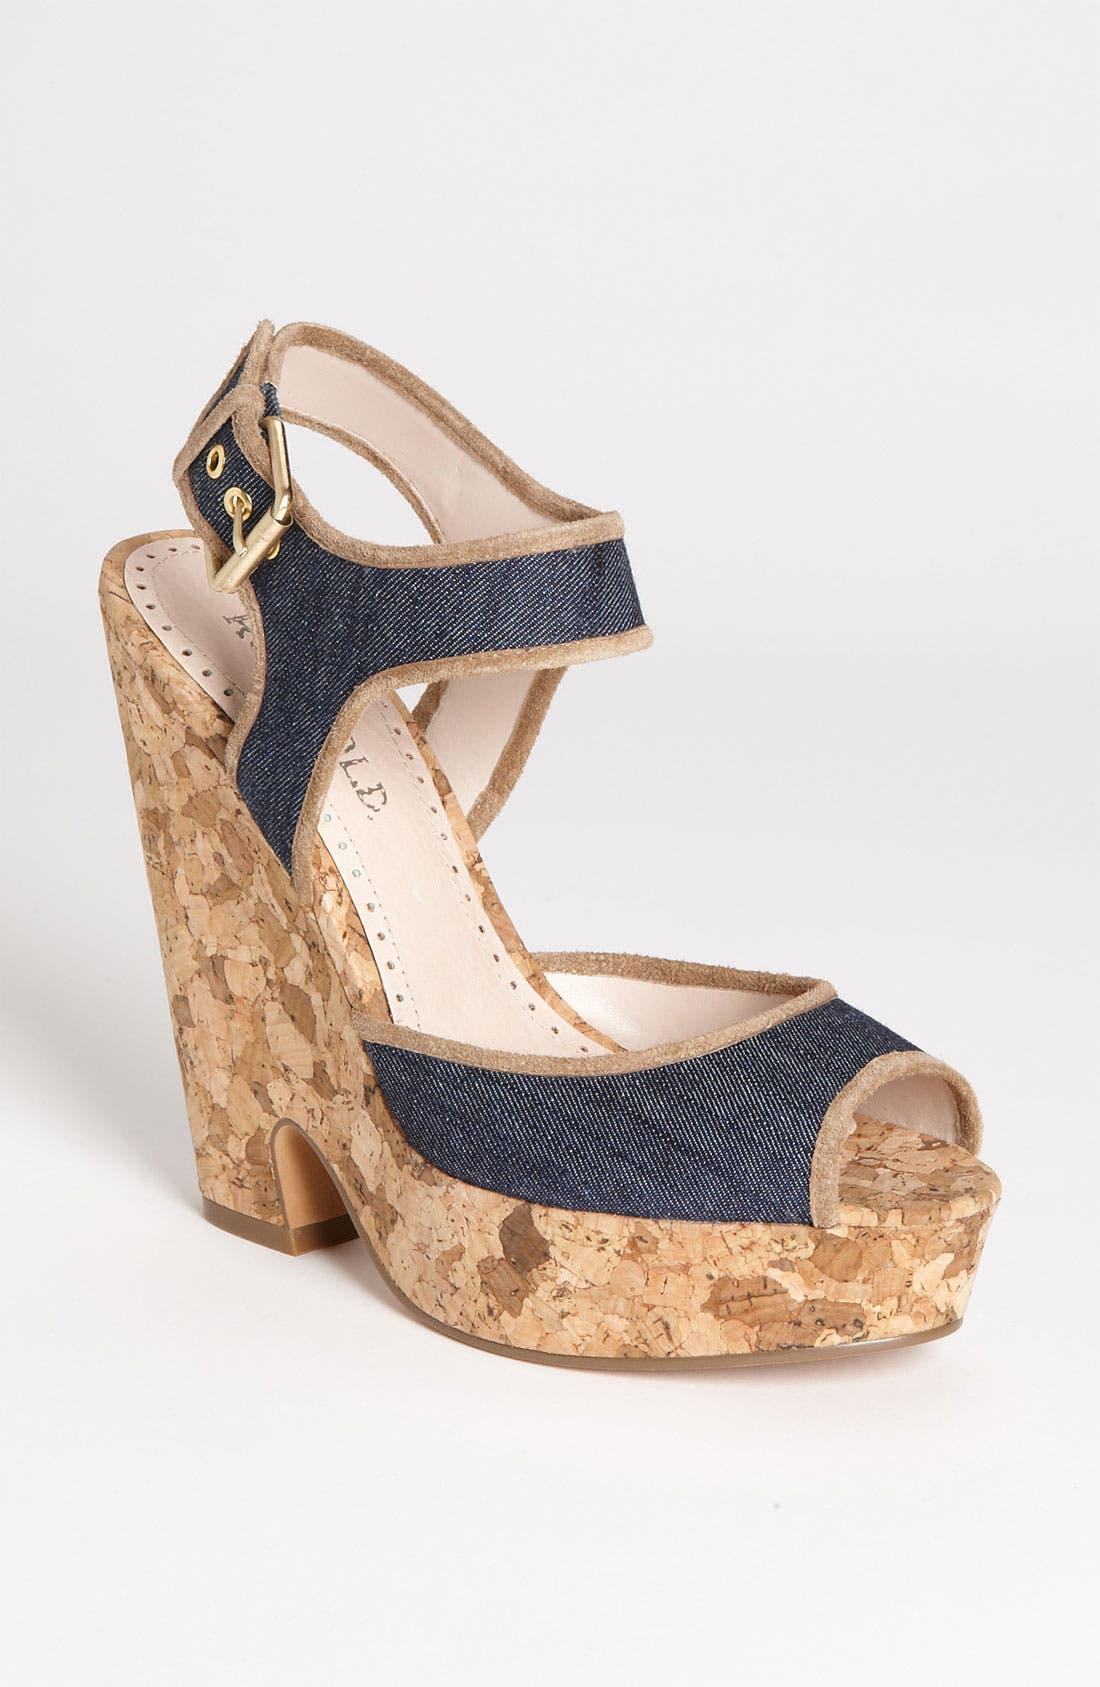 Alternate Image 1 Selected - Rosegold 'Lara' Sandal